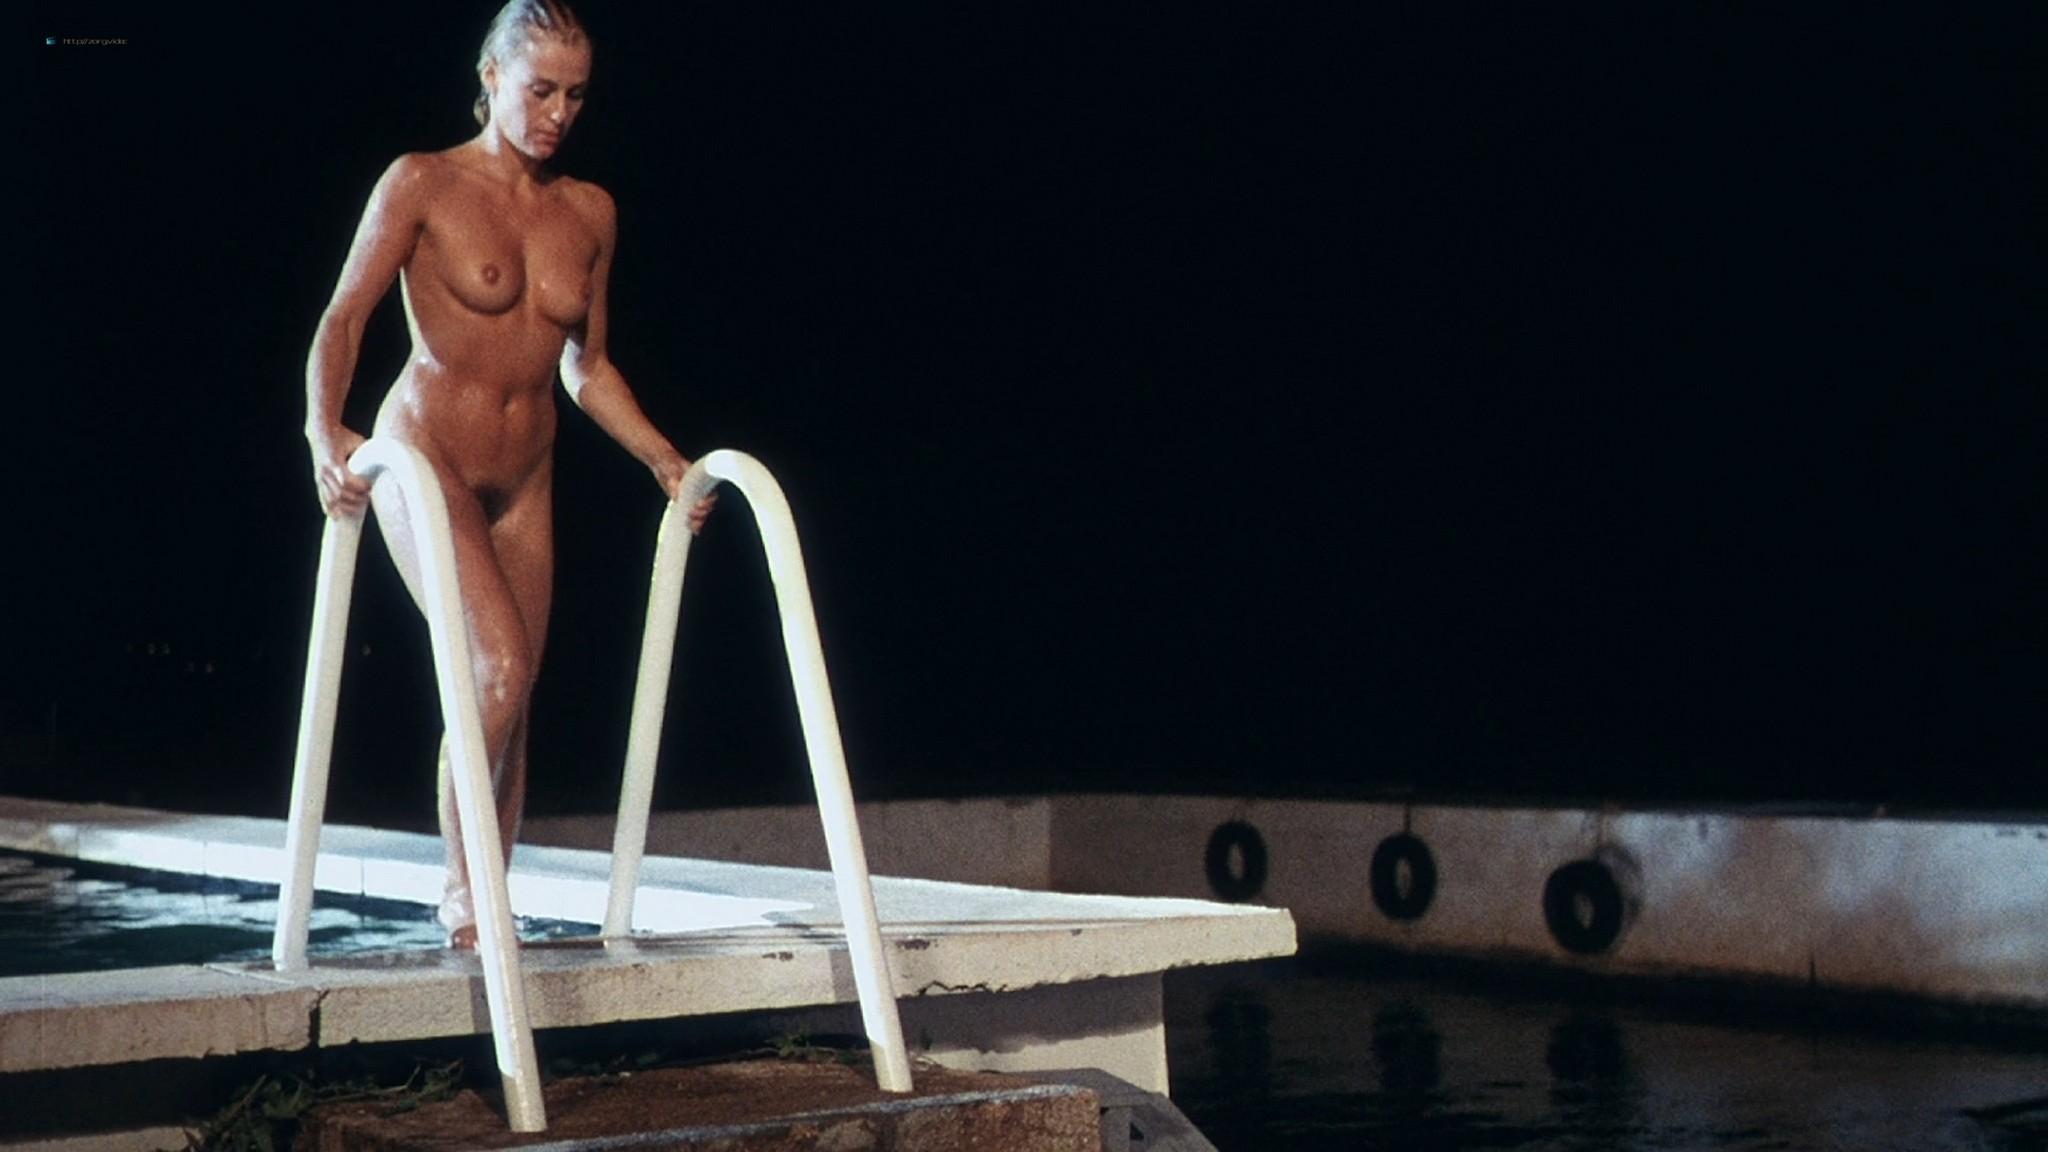 Belinda Mayne nude full frontal - White Fire (1984) HD 1080p BluRay (13)